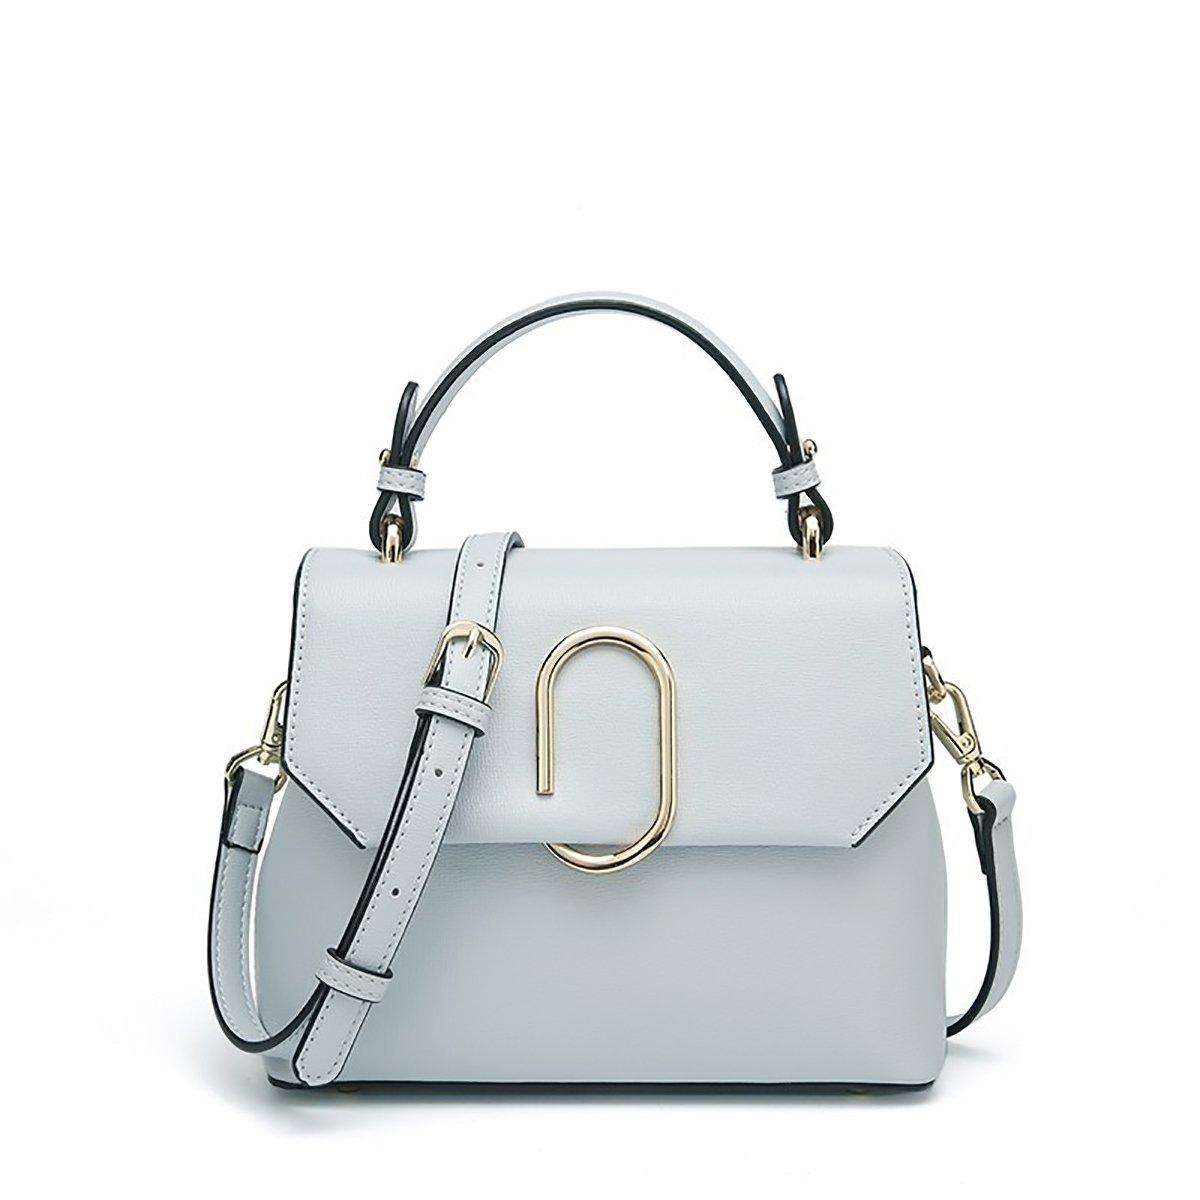 Tisdaini women's mini bag PU leather shoulder bags sweet little crossbody bag for young lady girls KA-KCA57902